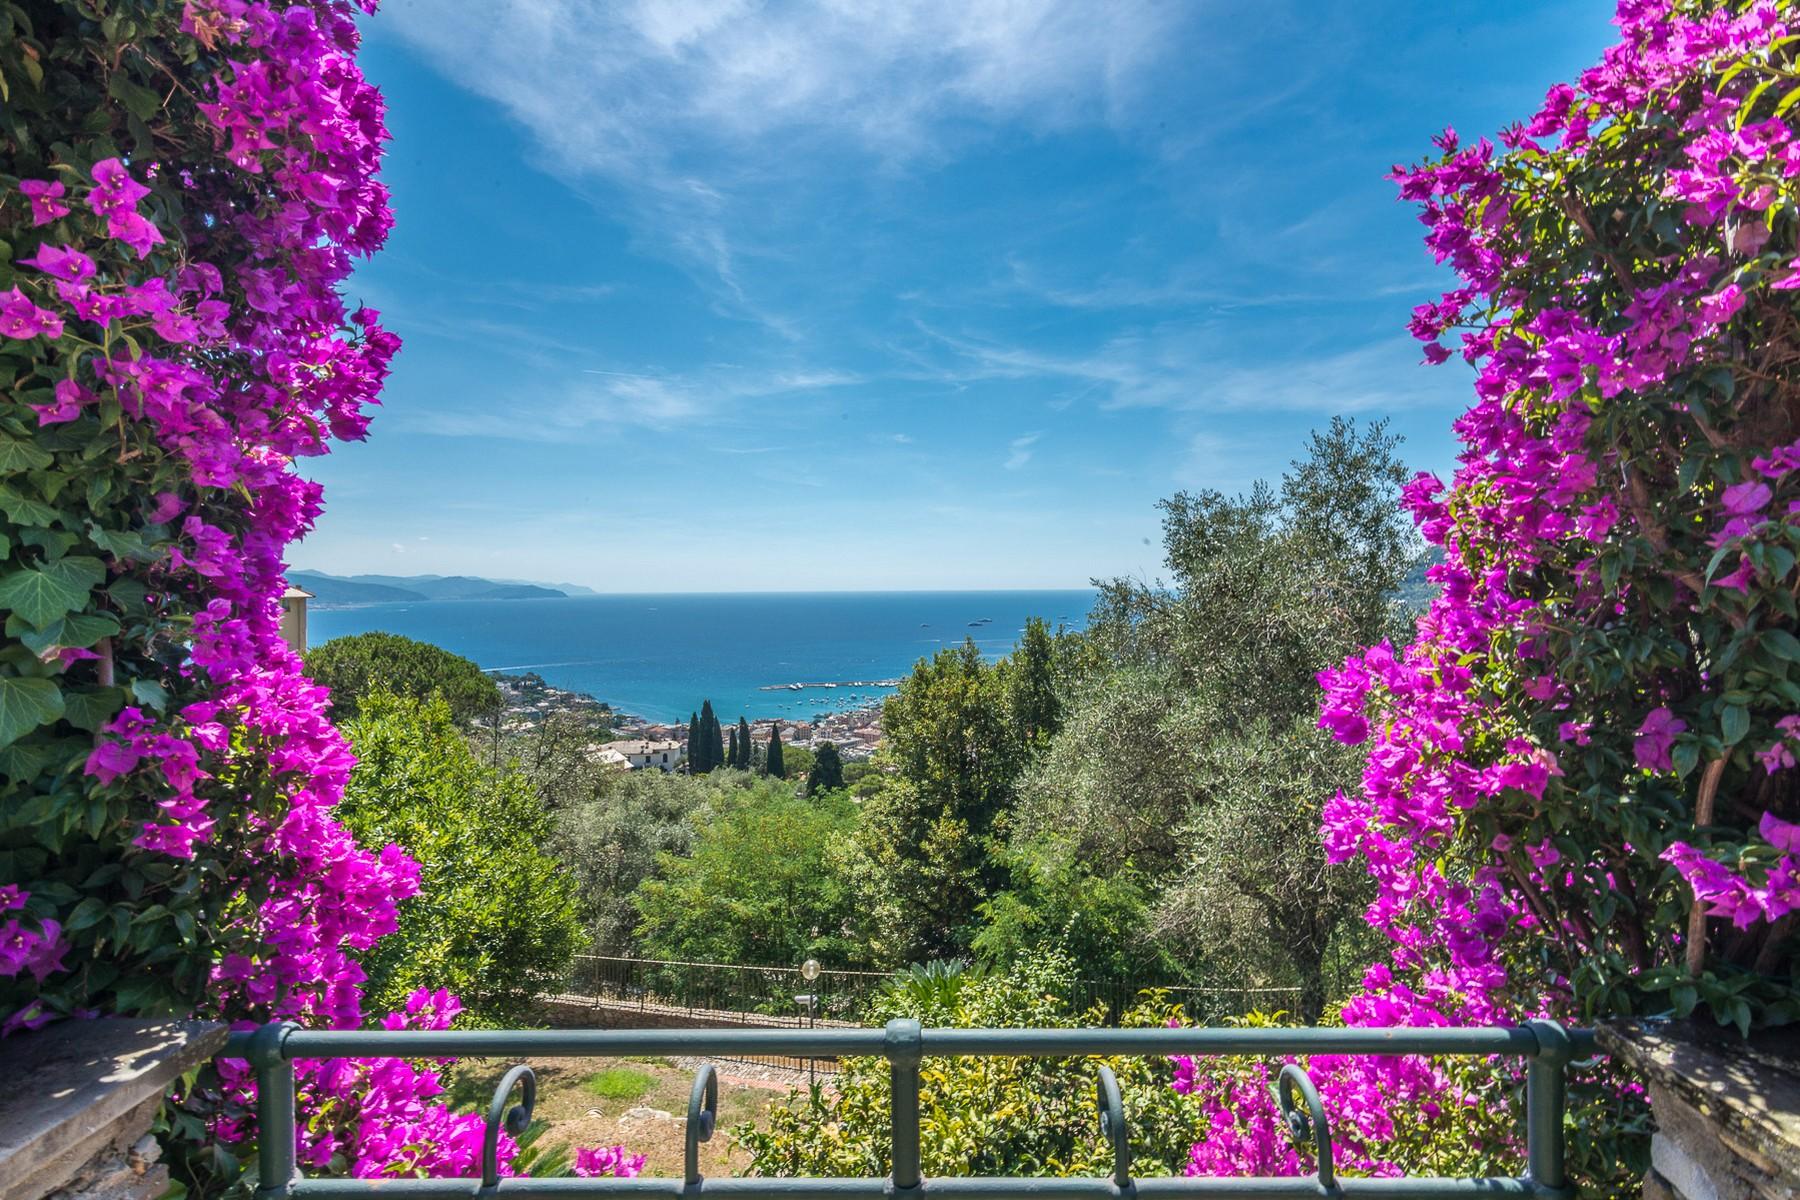 Villa in Vendita a Santa Margherita Ligure: 5 locali, 180 mq - Foto 2